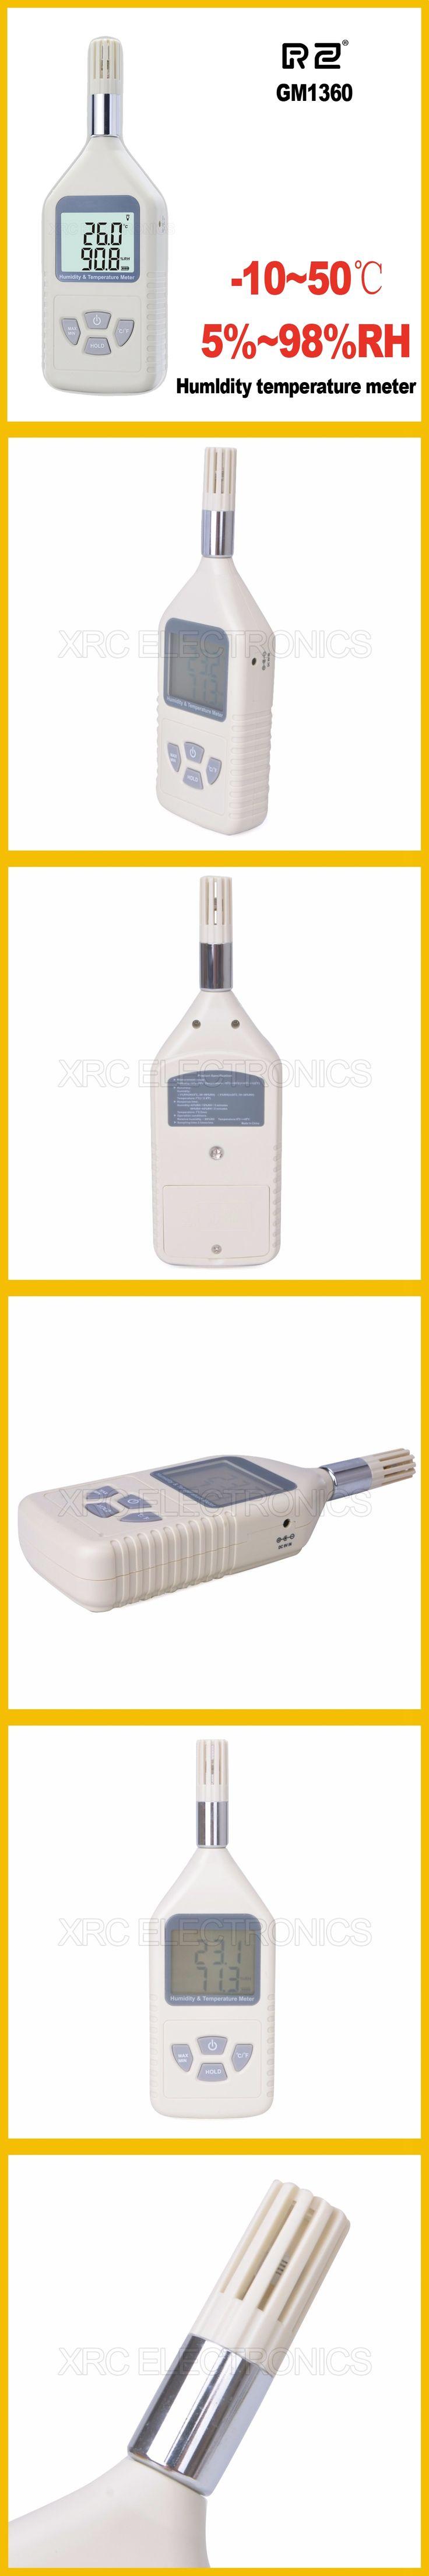 GM1360 Humidity  Temperature meter Measure Range -10~50C